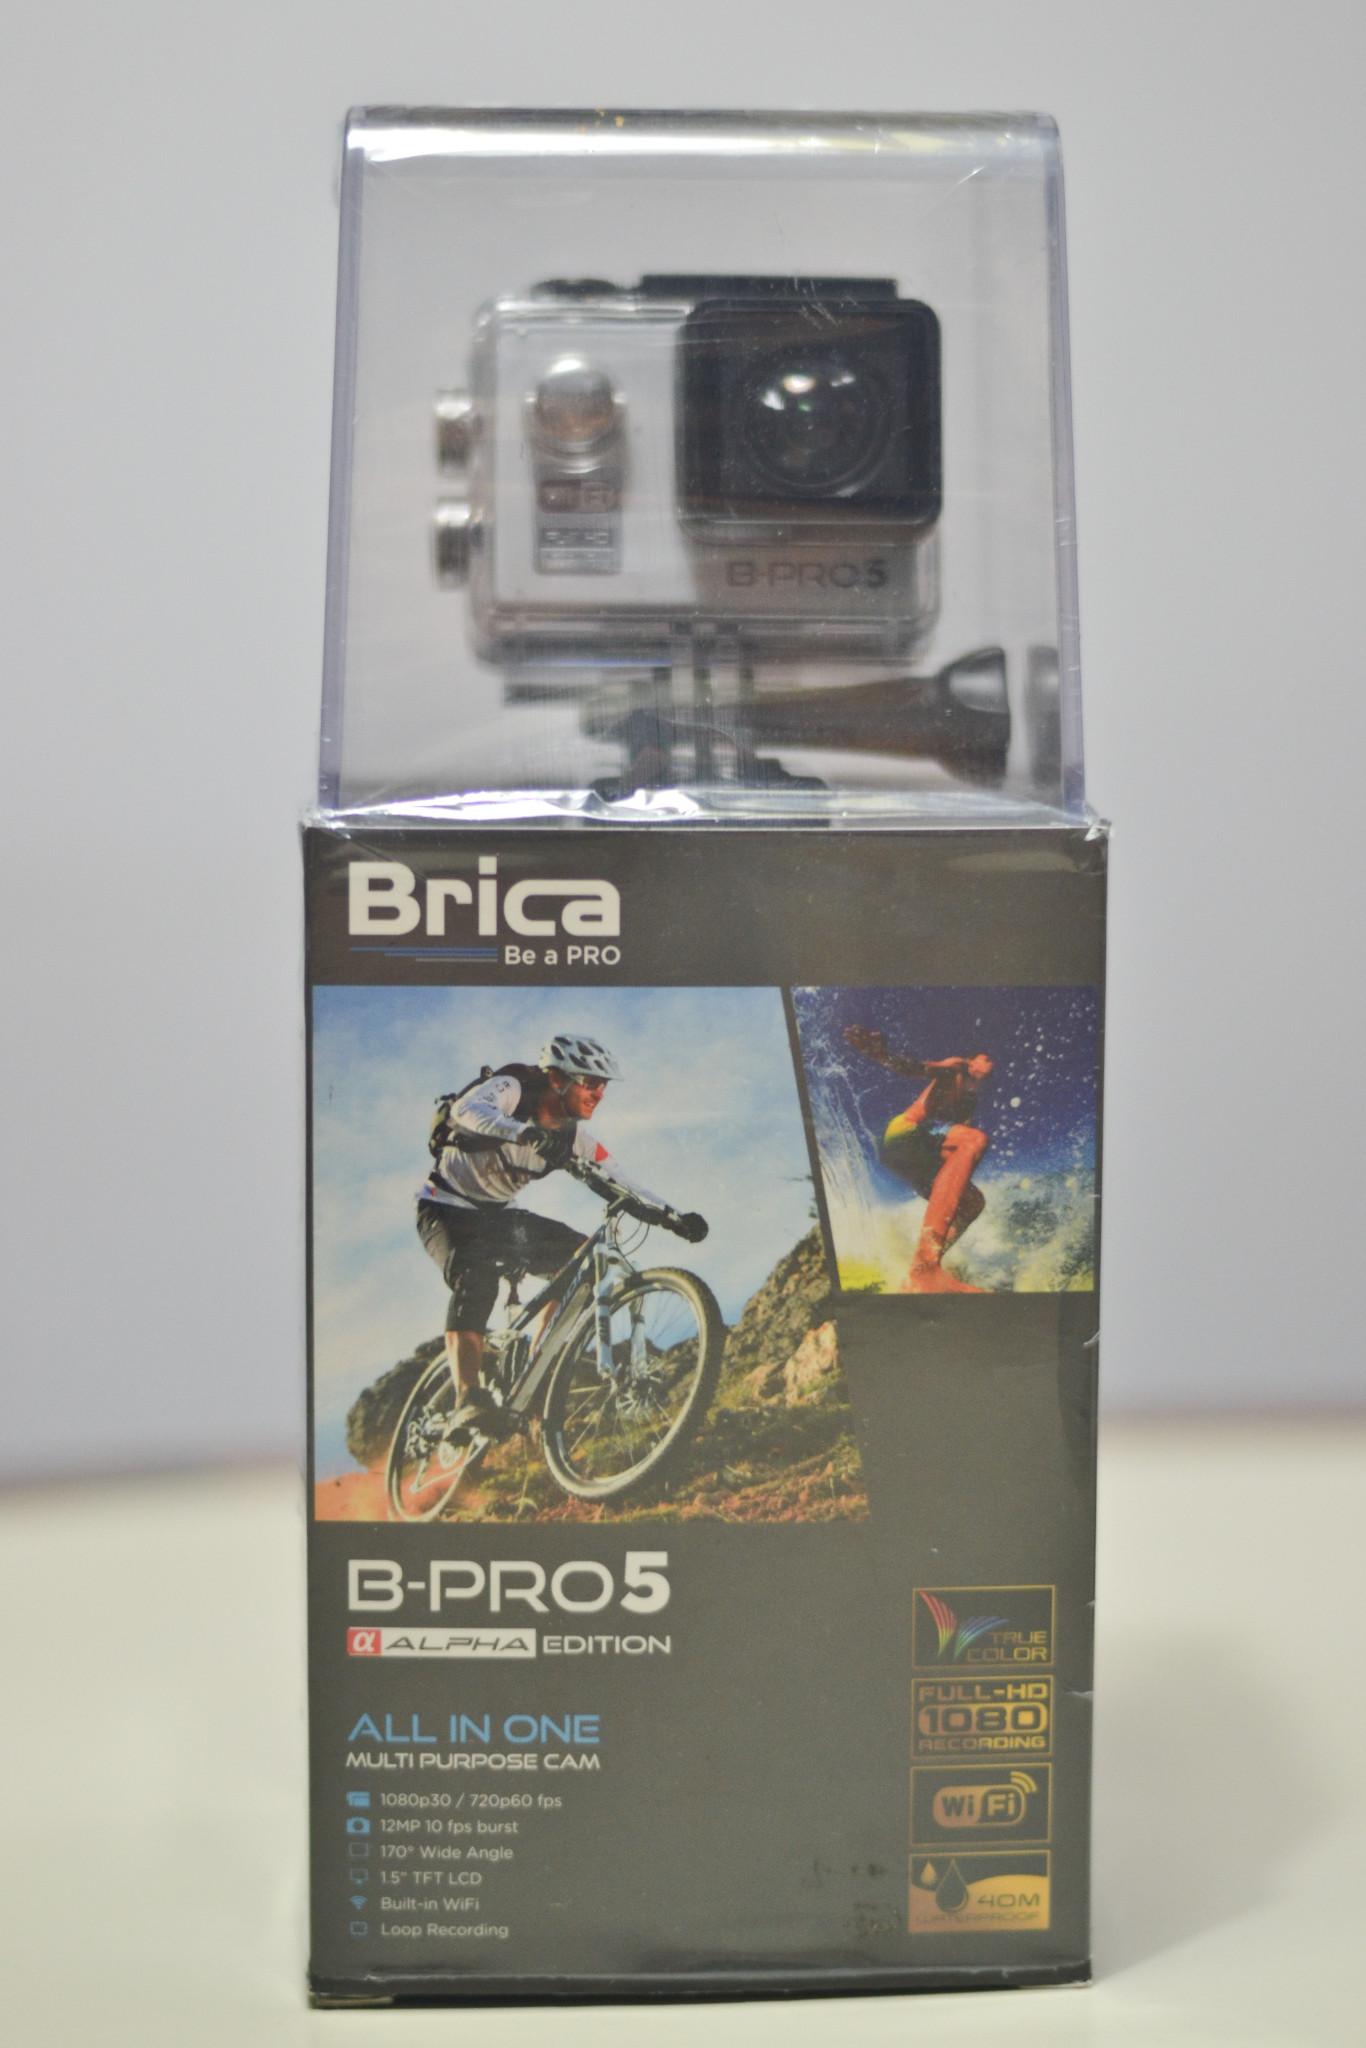 Jual Brica BPro 5 Alpha Edition  Bandung Juara | Tokopedia